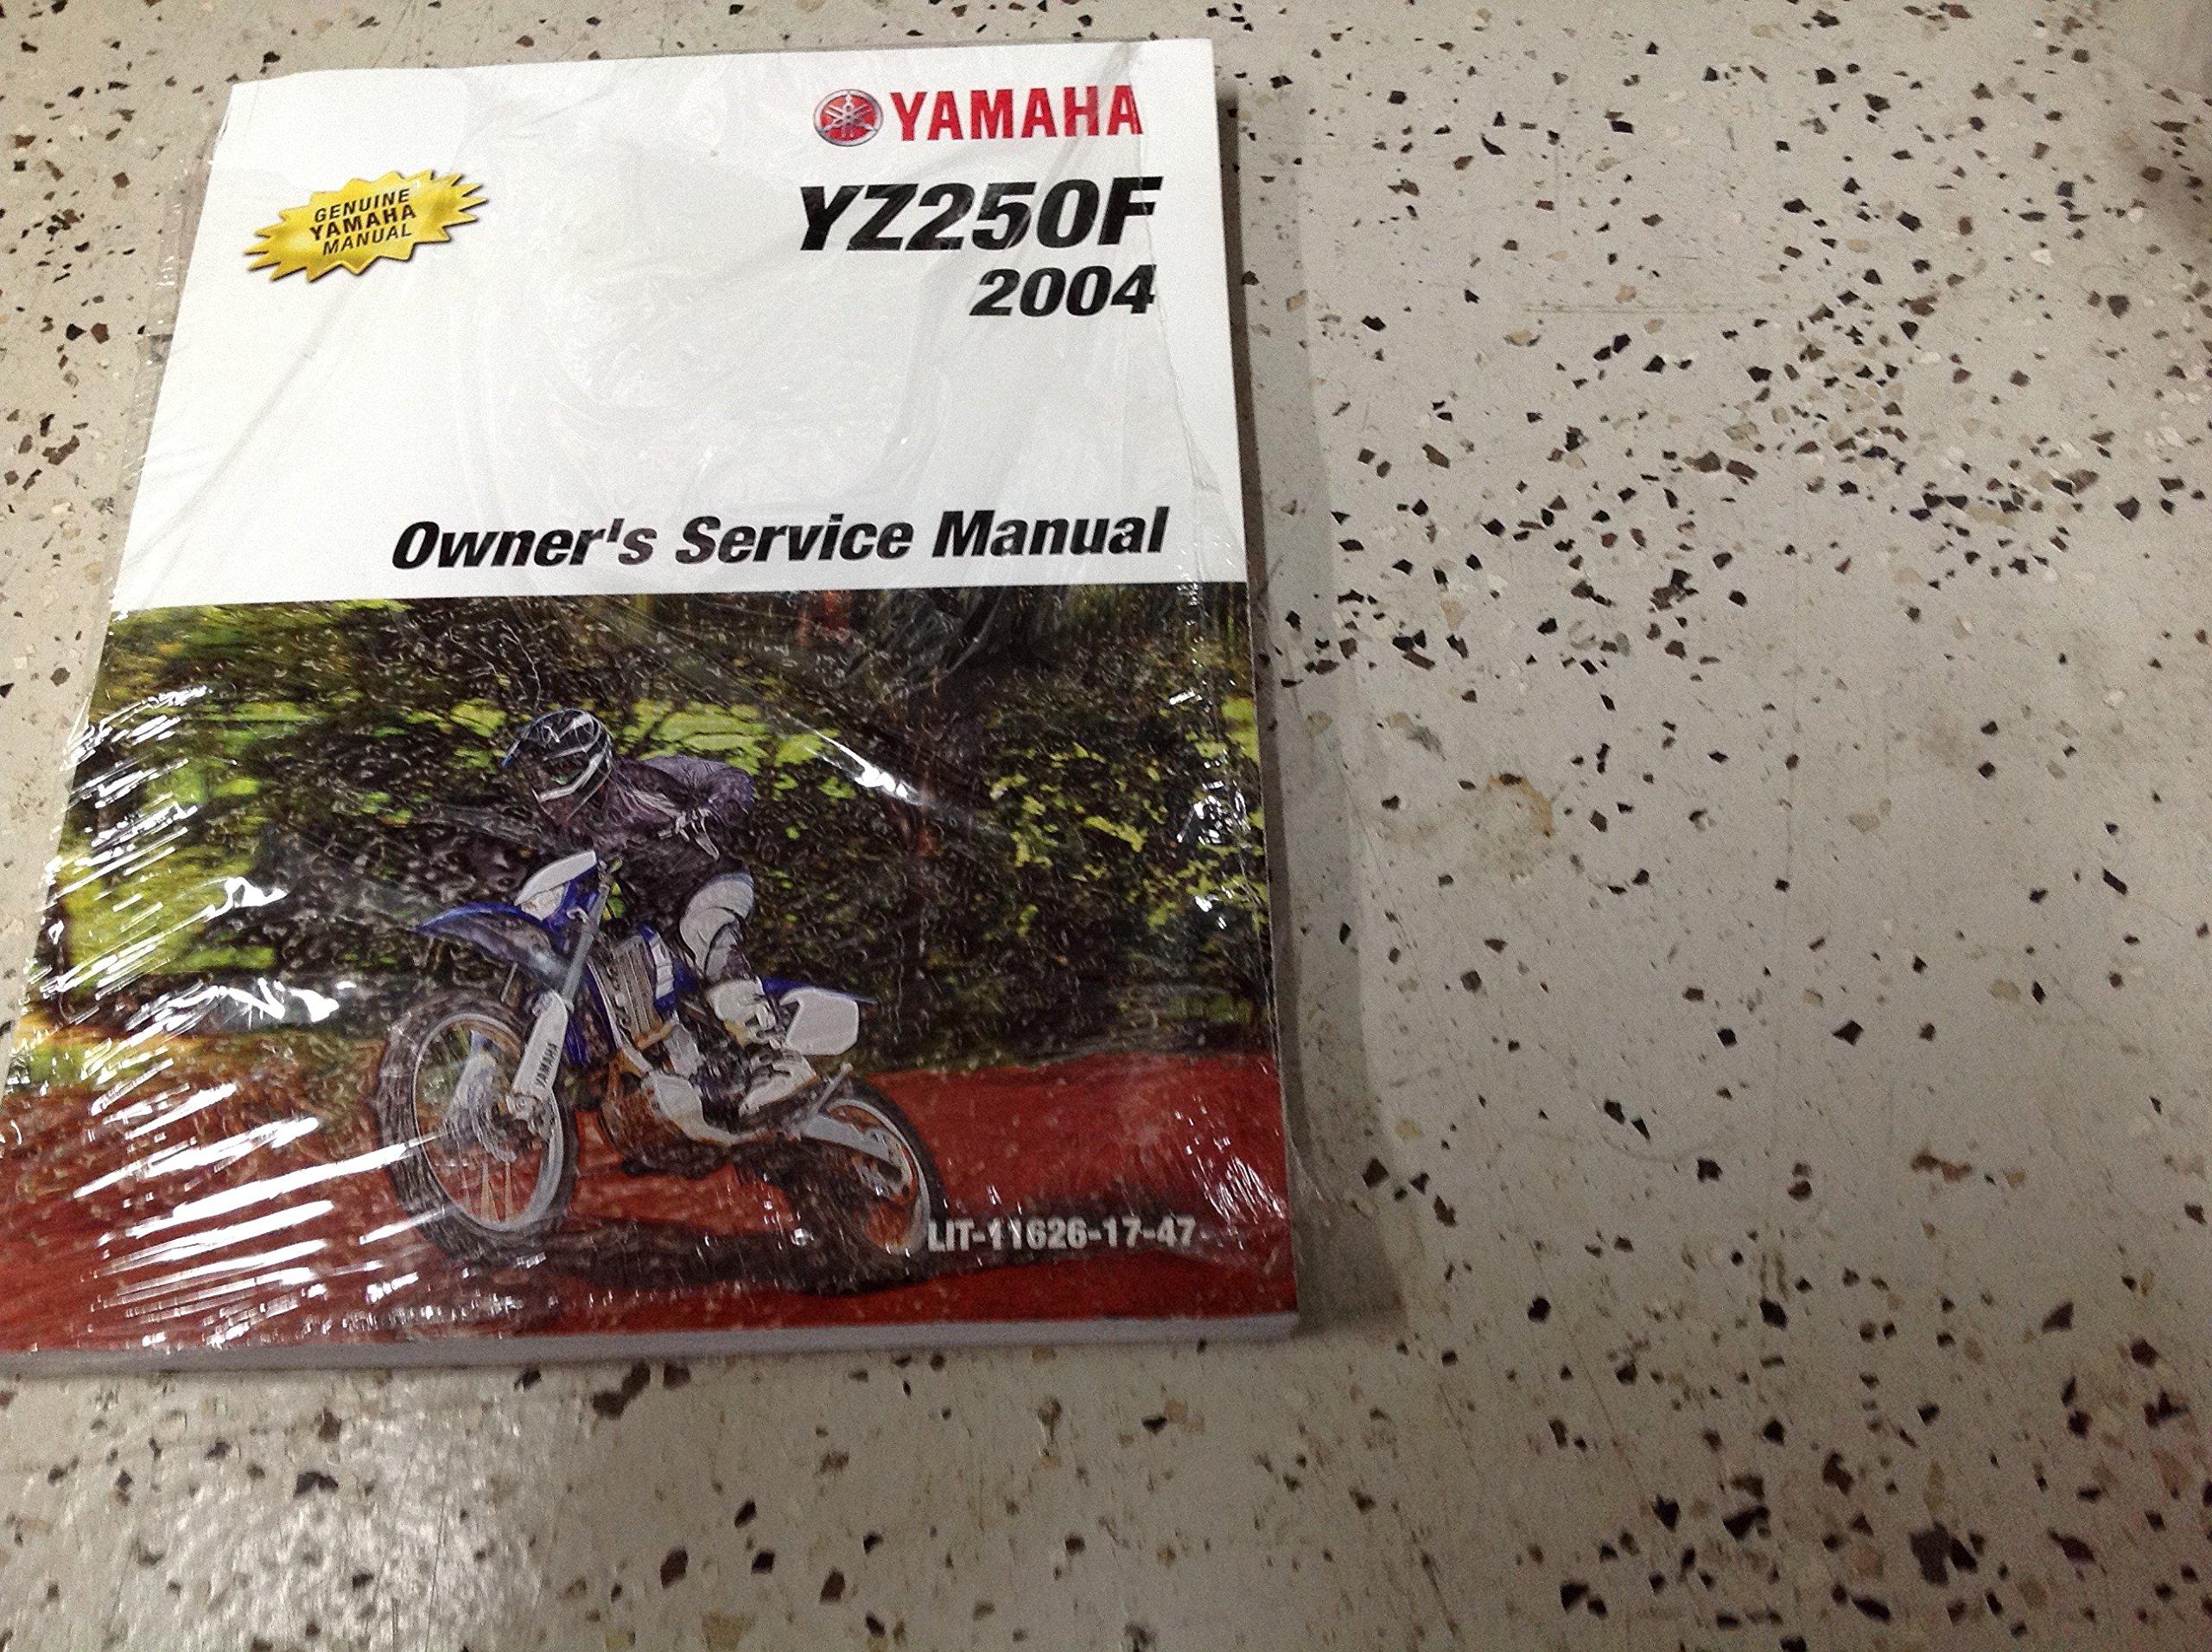 2004 Yamaha YZ250F Owners Service Repair Shop Workshop Manual FACTORY OEM:  YAMAHA INC: Amazon.com: Books